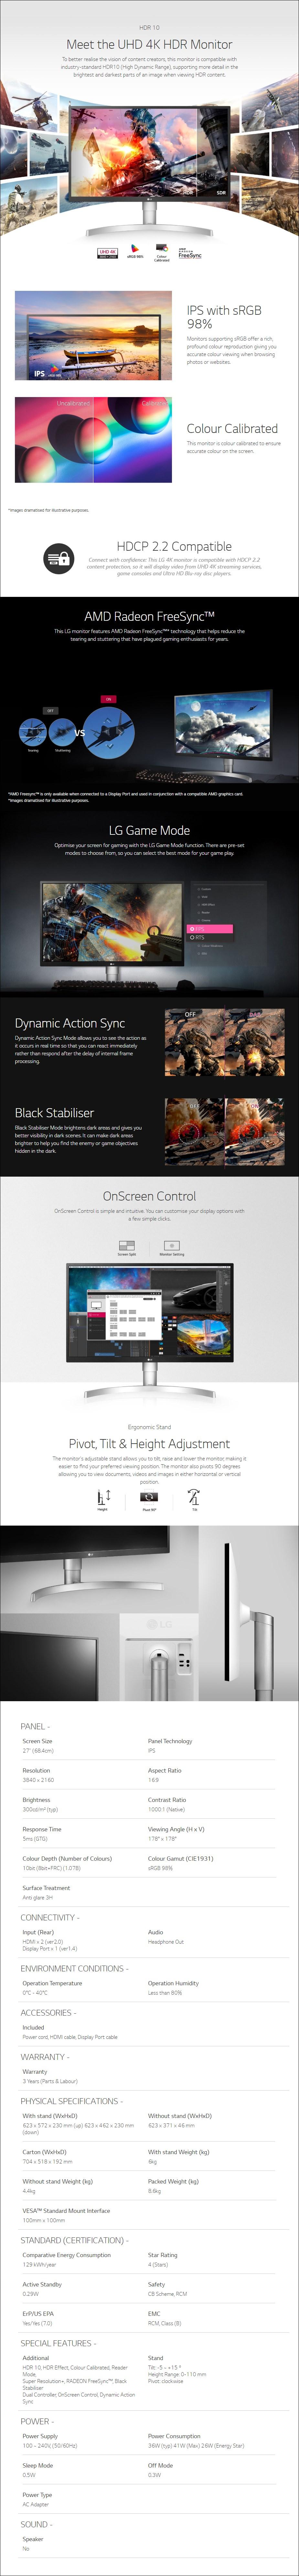 "LG 27UL550-W 27"" 4K UHD HDR10 98% sRGB Calibrated FreeSync IPS Monitor - Overview 1"